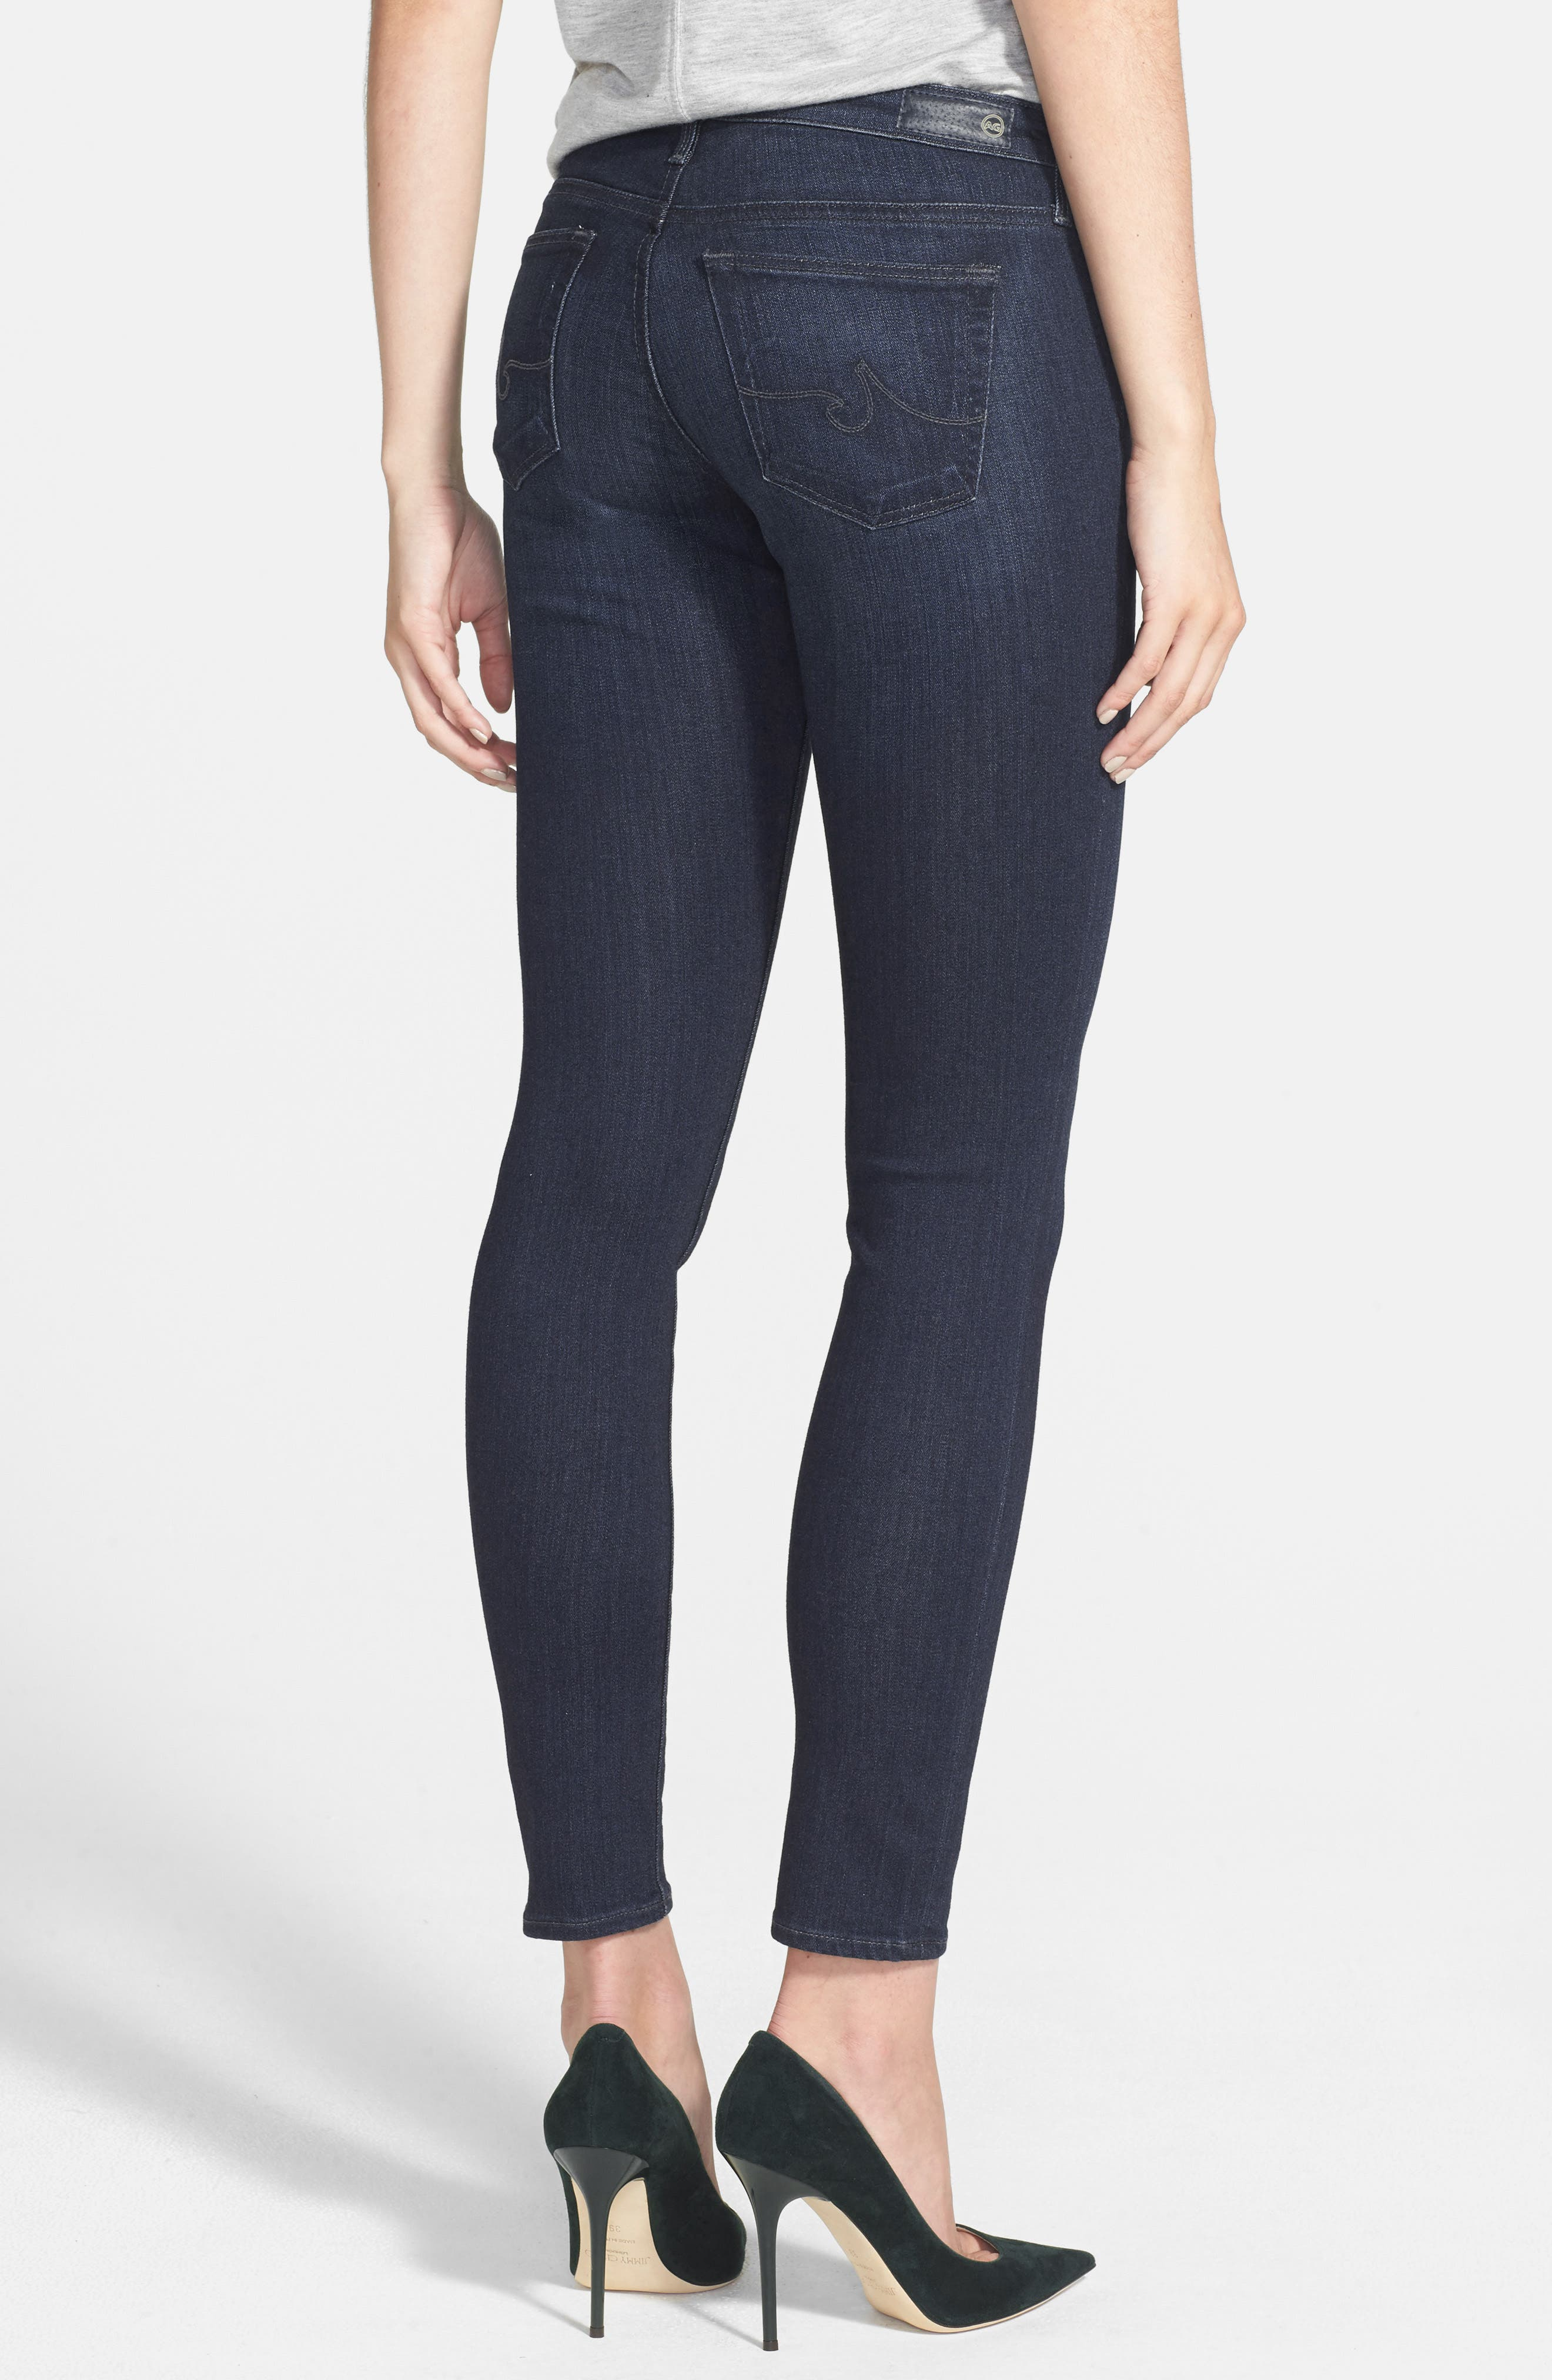 Alternate Image 3  - AG The Legging Ankle Super Skinny Jeans (Coal Grey)